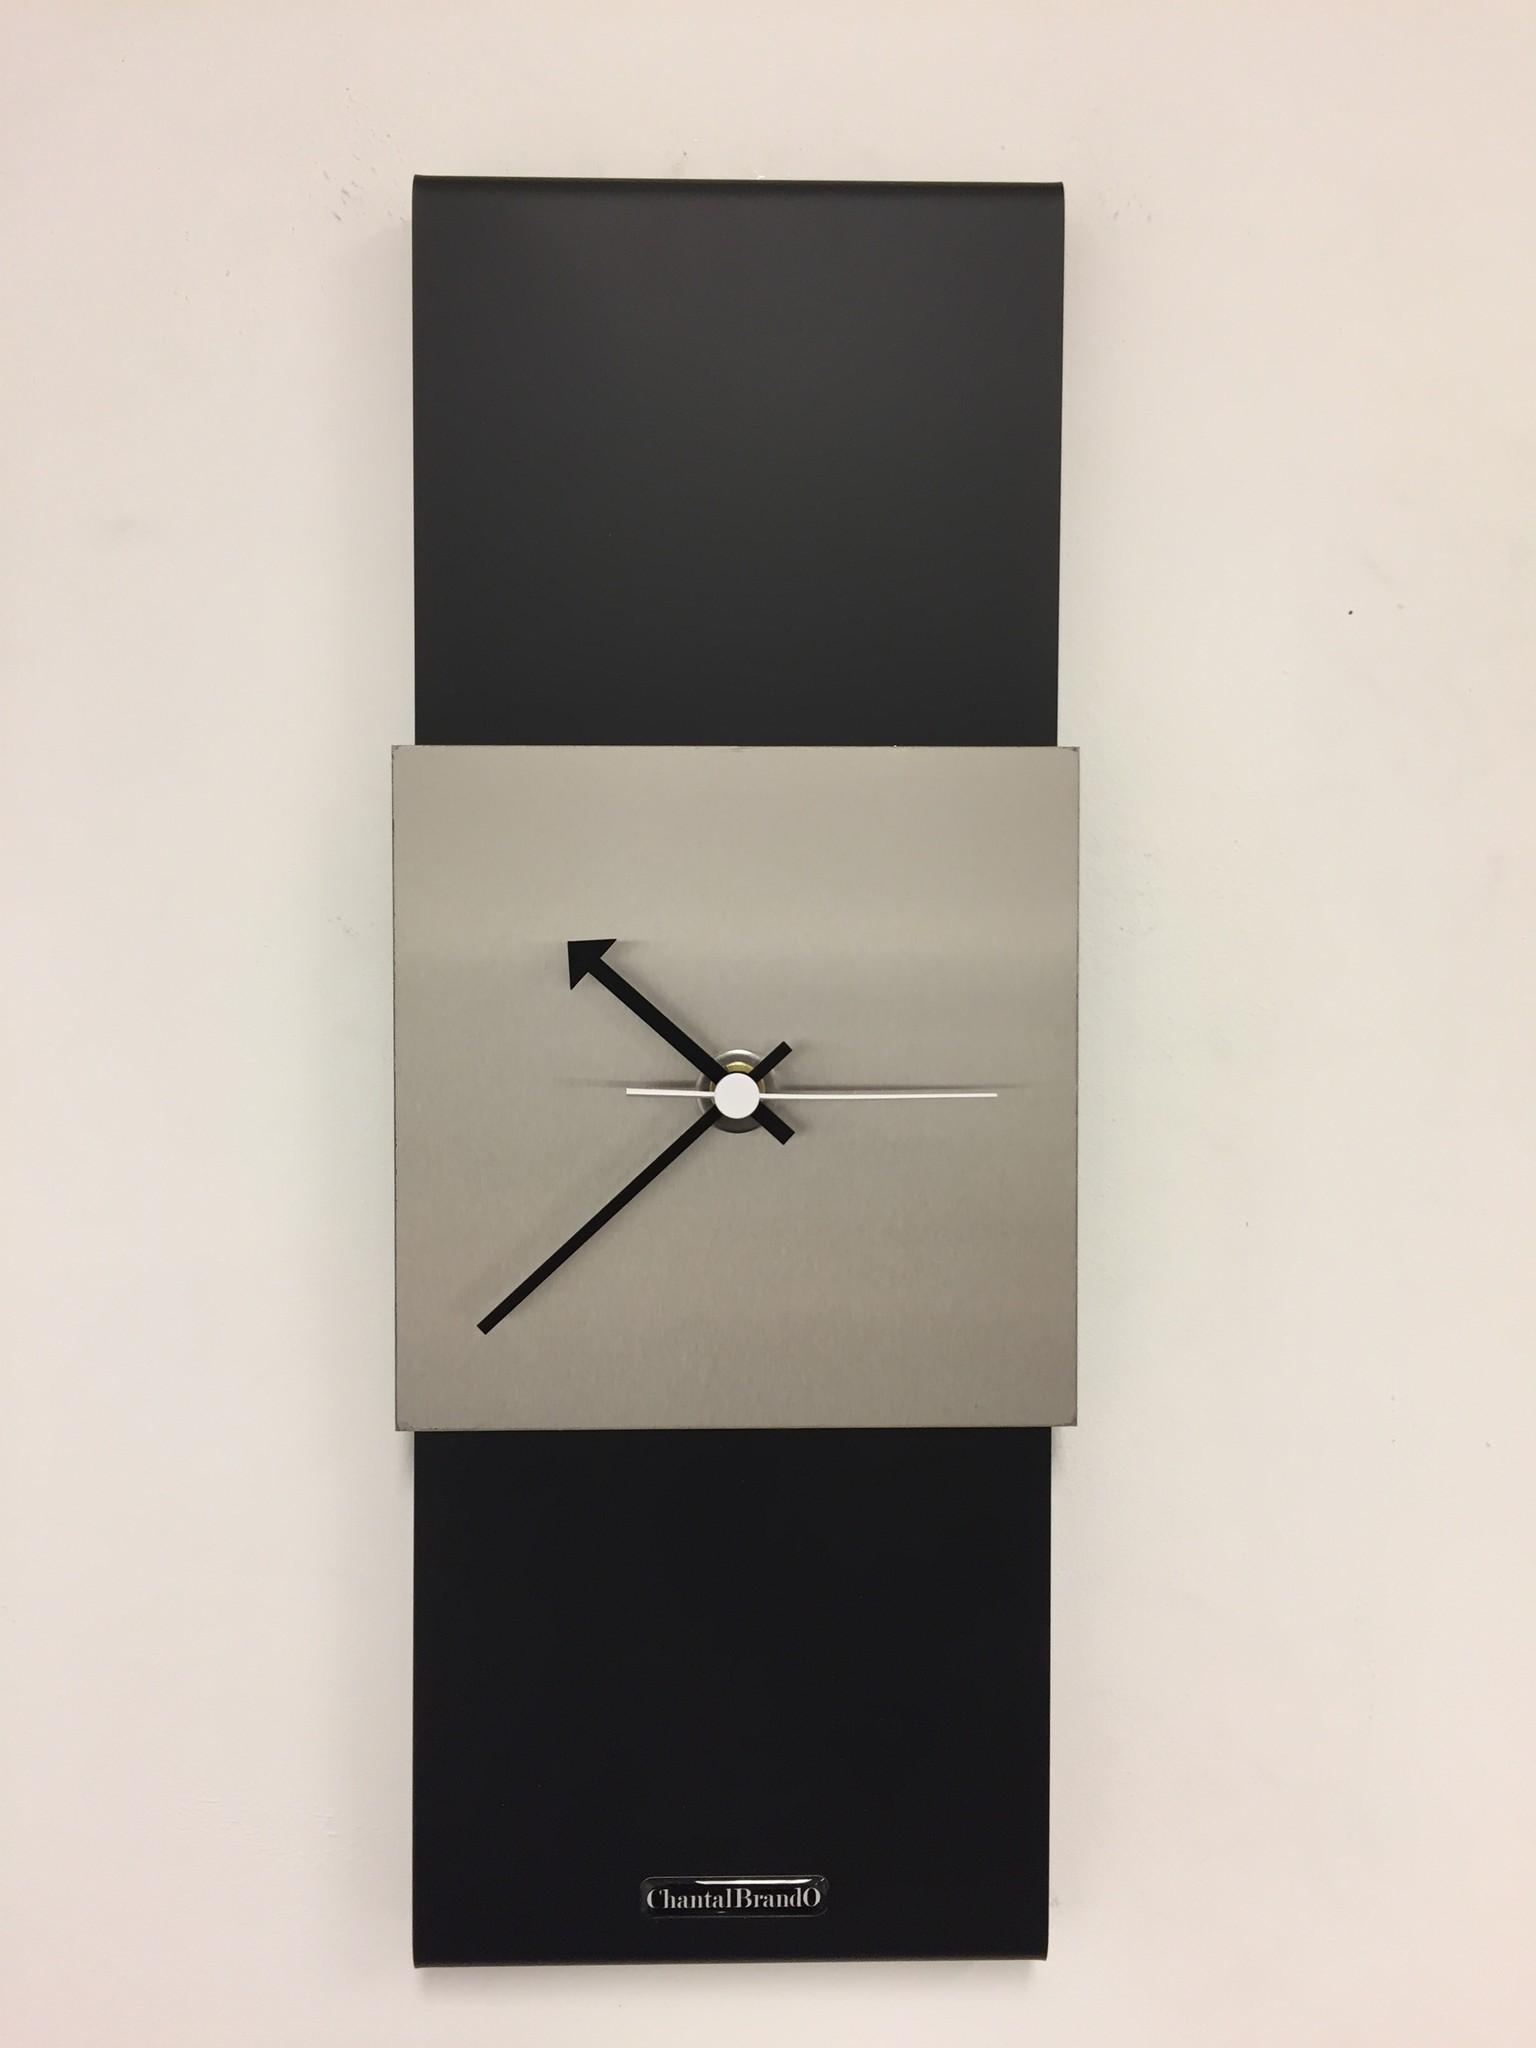 ChantalBrandO Wandklok Black-Line Silver Square White Pointer Modern Design